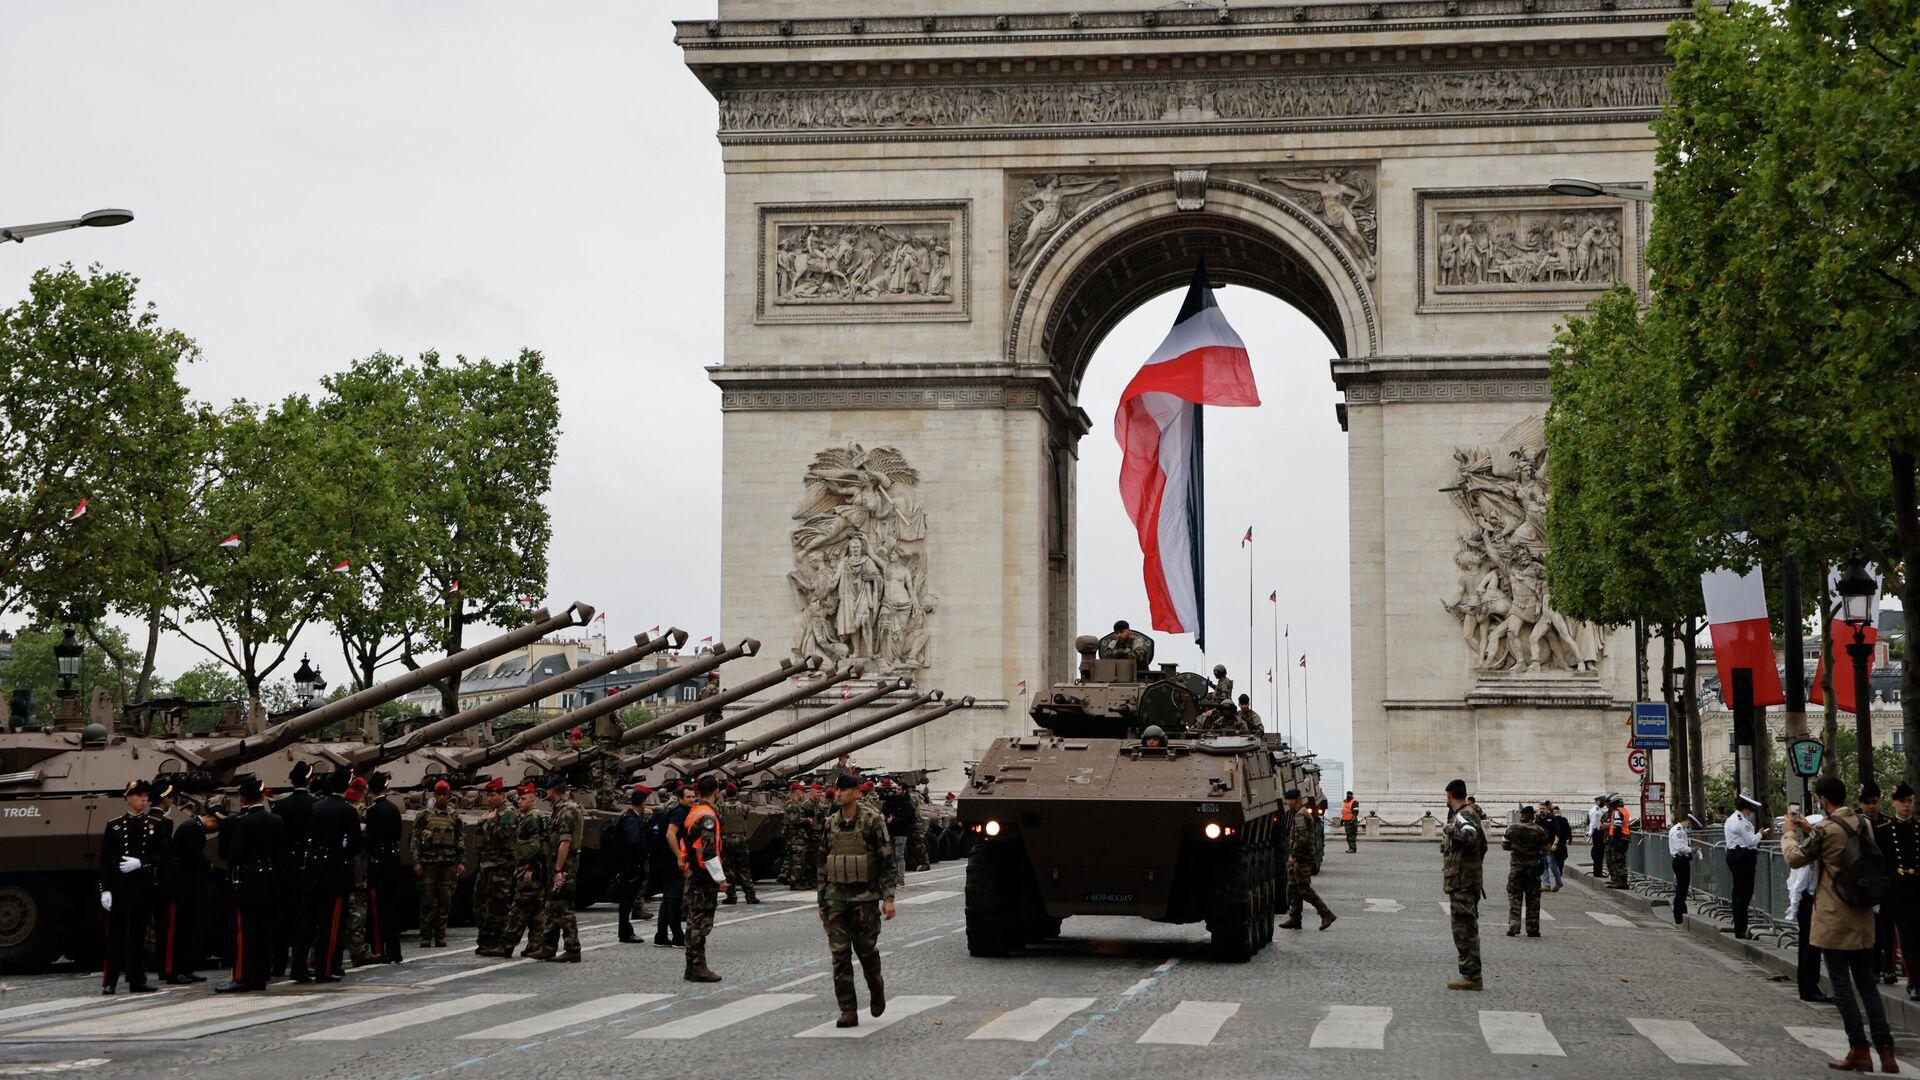 Vojna parada u Parizu - Sputnik Srbija, 1920, 12.09.2021